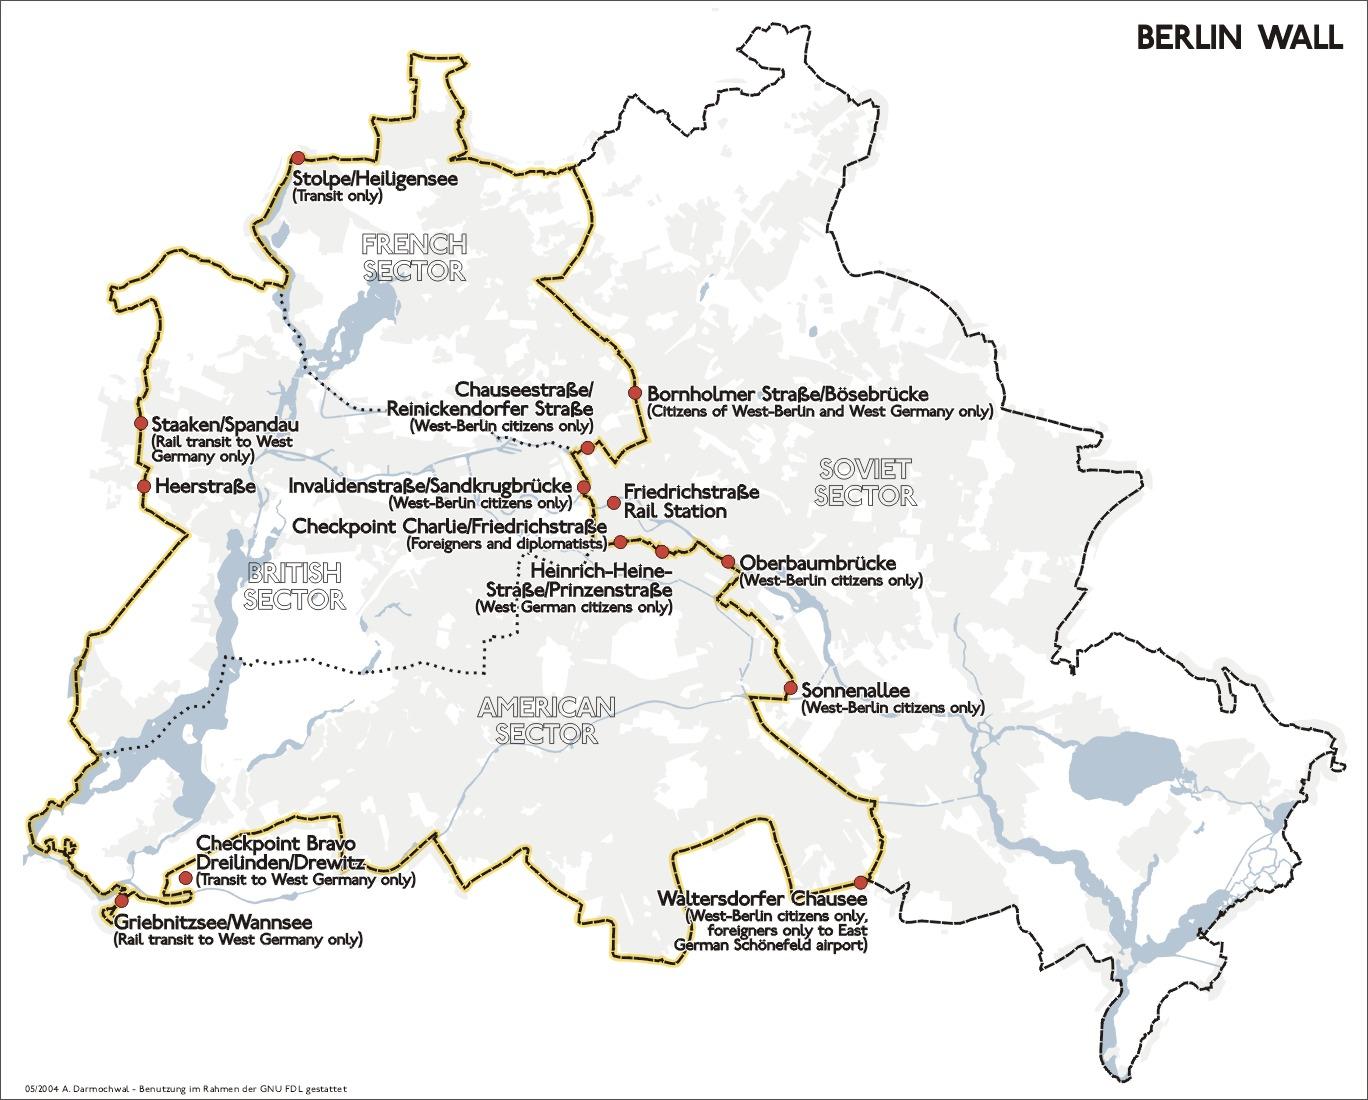 Karte_berliner_mauer_en.jpg